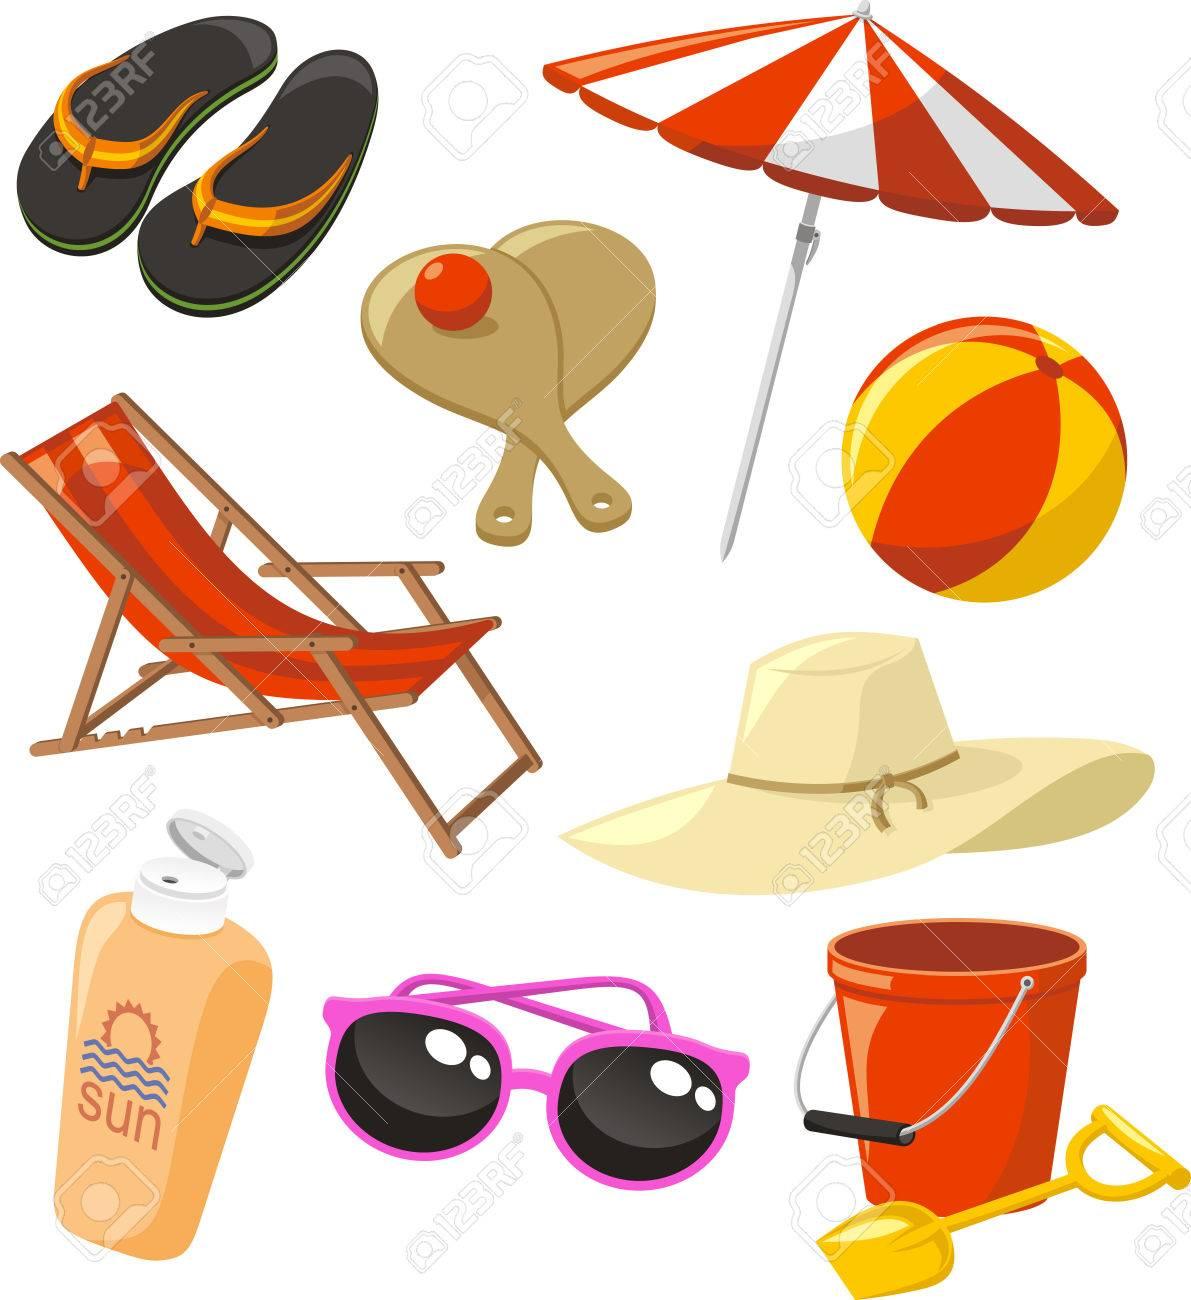 Flip Flop Chair Beach Set Icons With Flip Flop Sandals Beach Tennis Beach